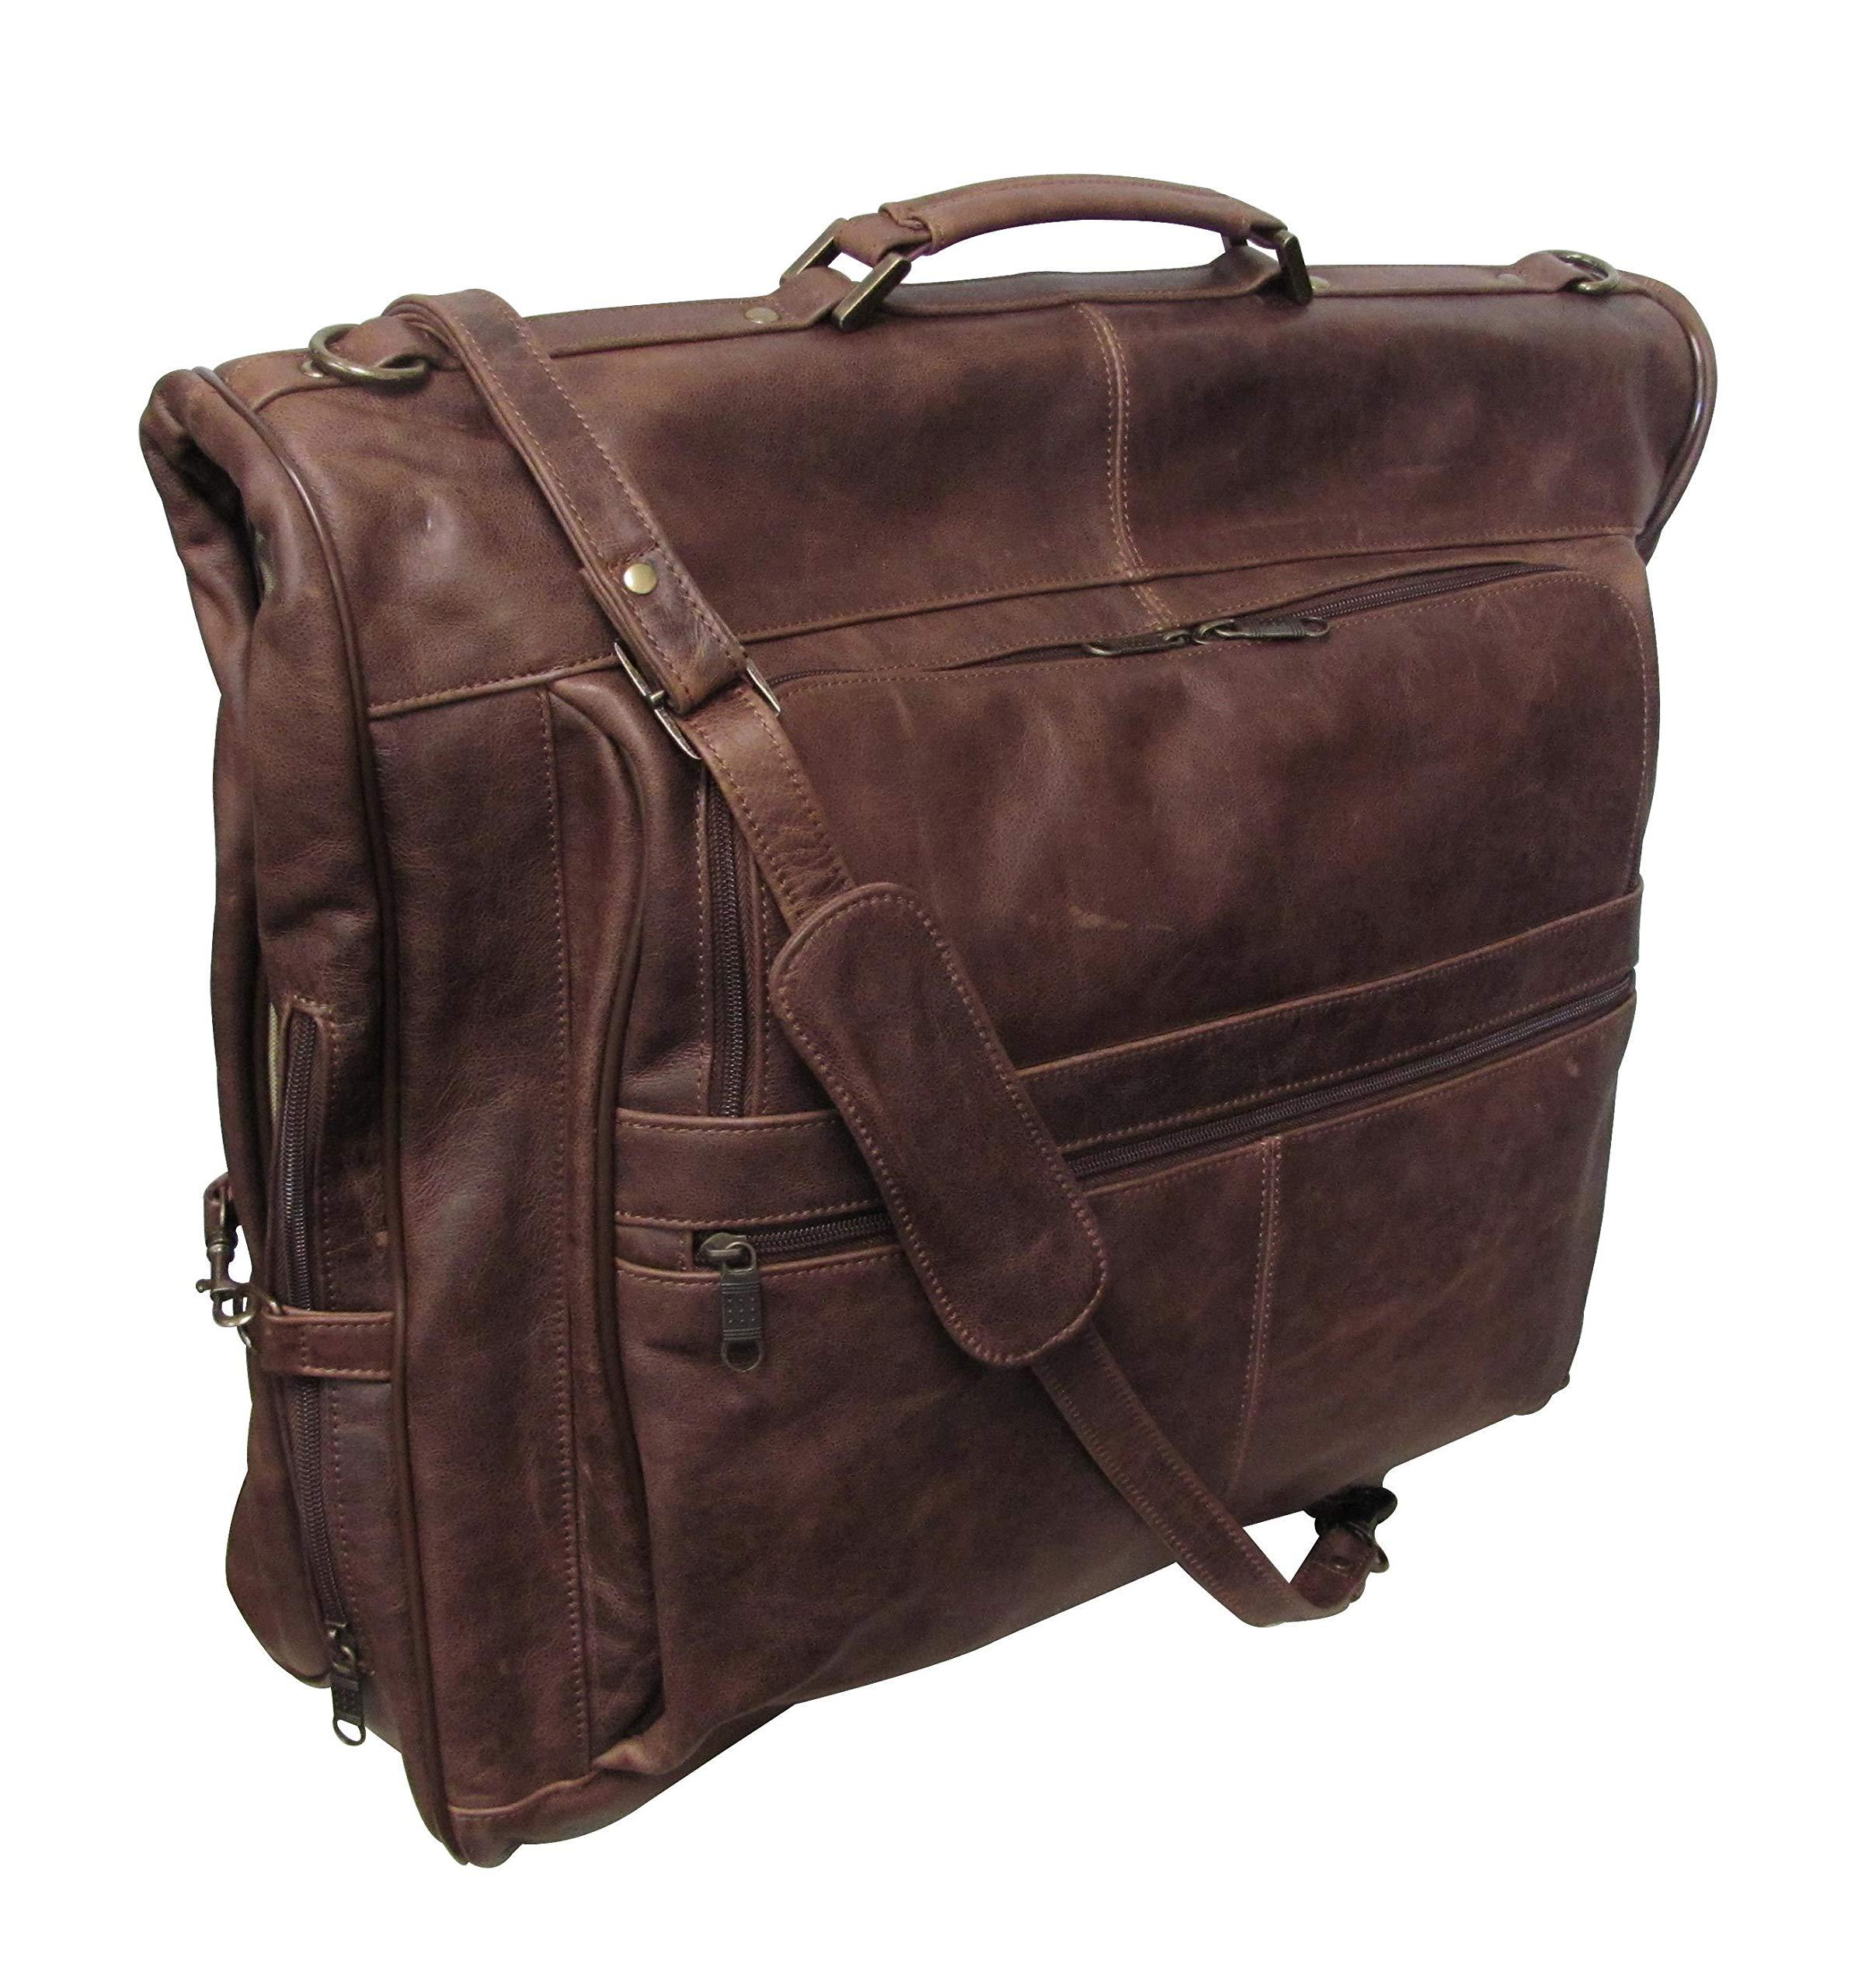 AmeriLeather Leather Three-suit Garment Bag (Vintage Terazzo Brown)